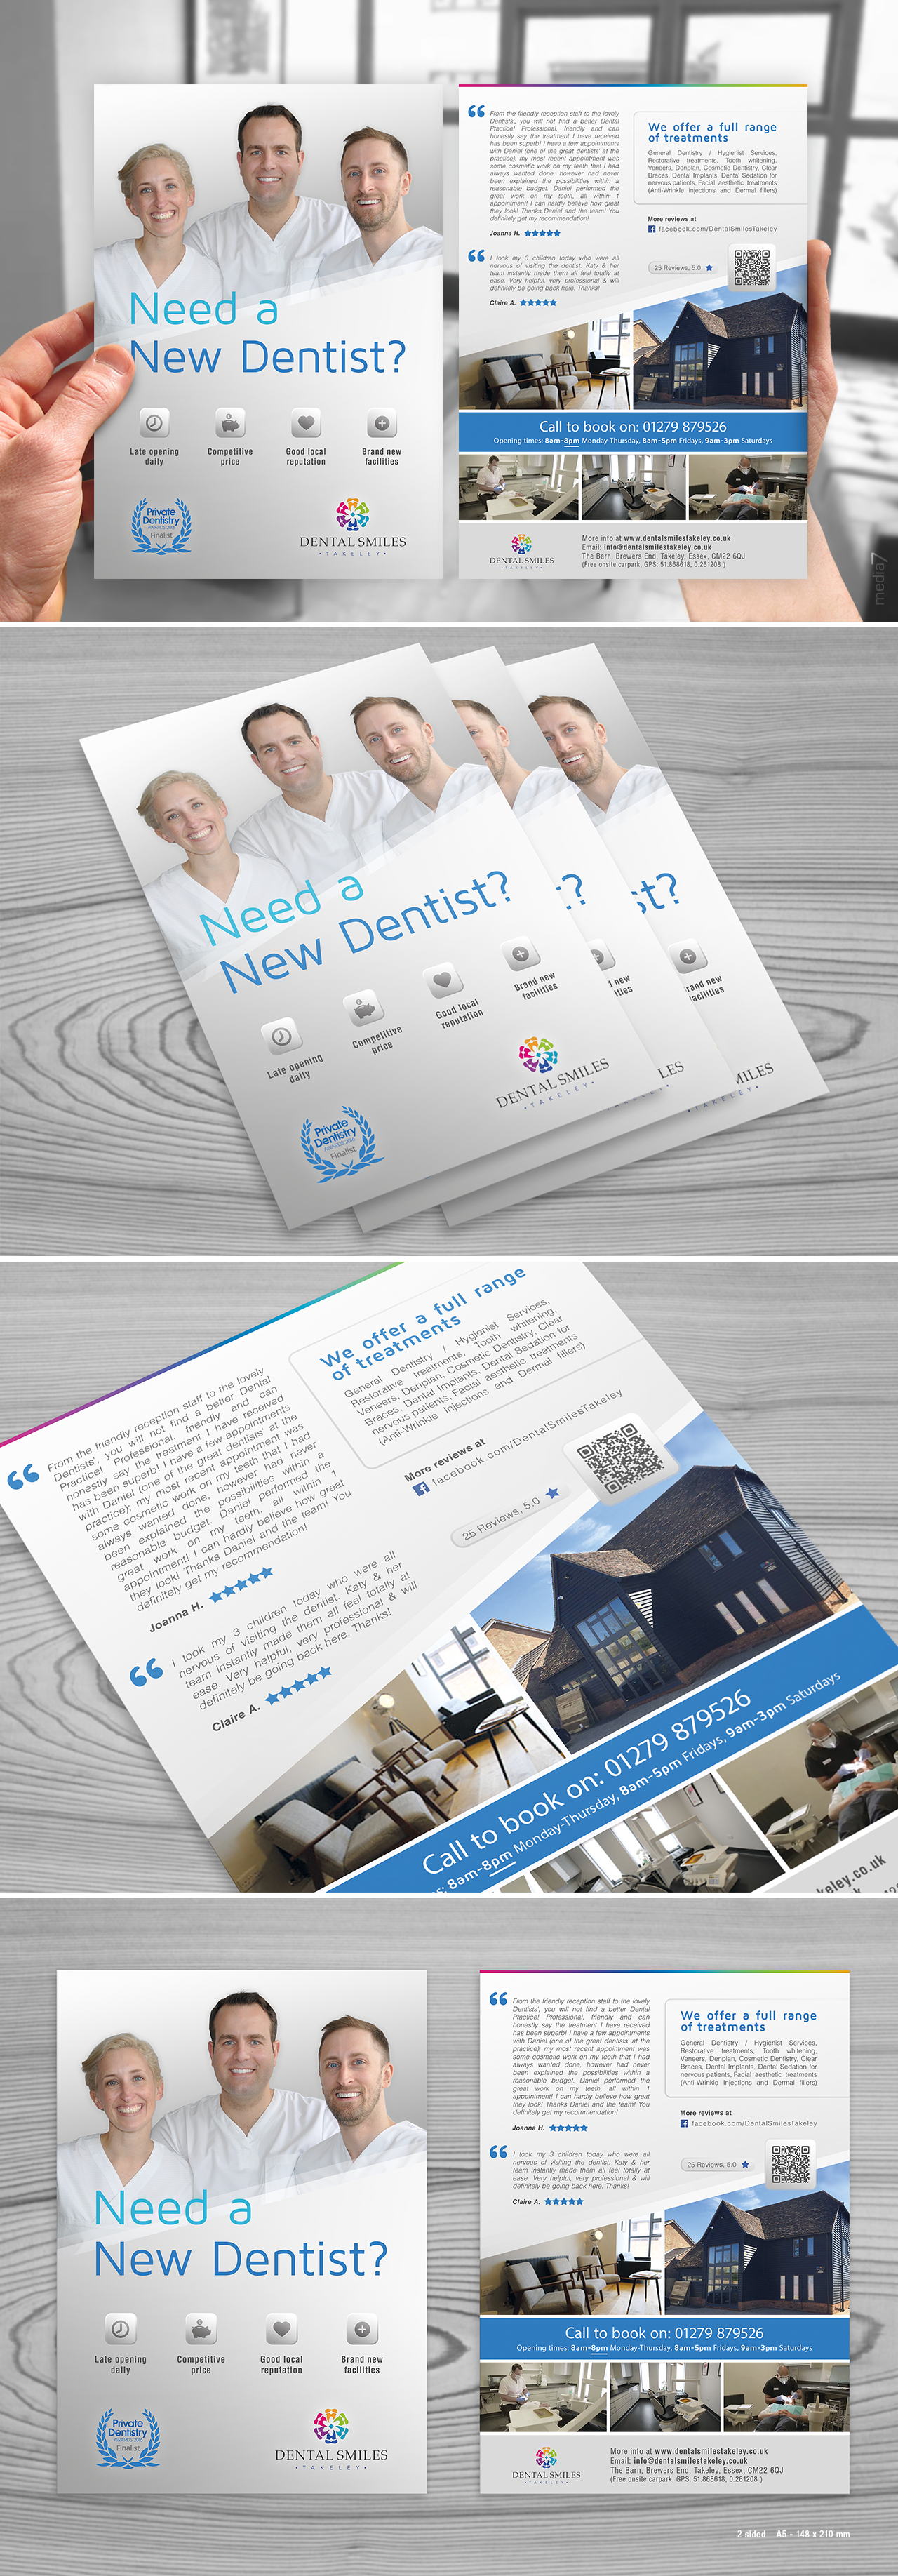 Browse original designs from media7 | 99designs